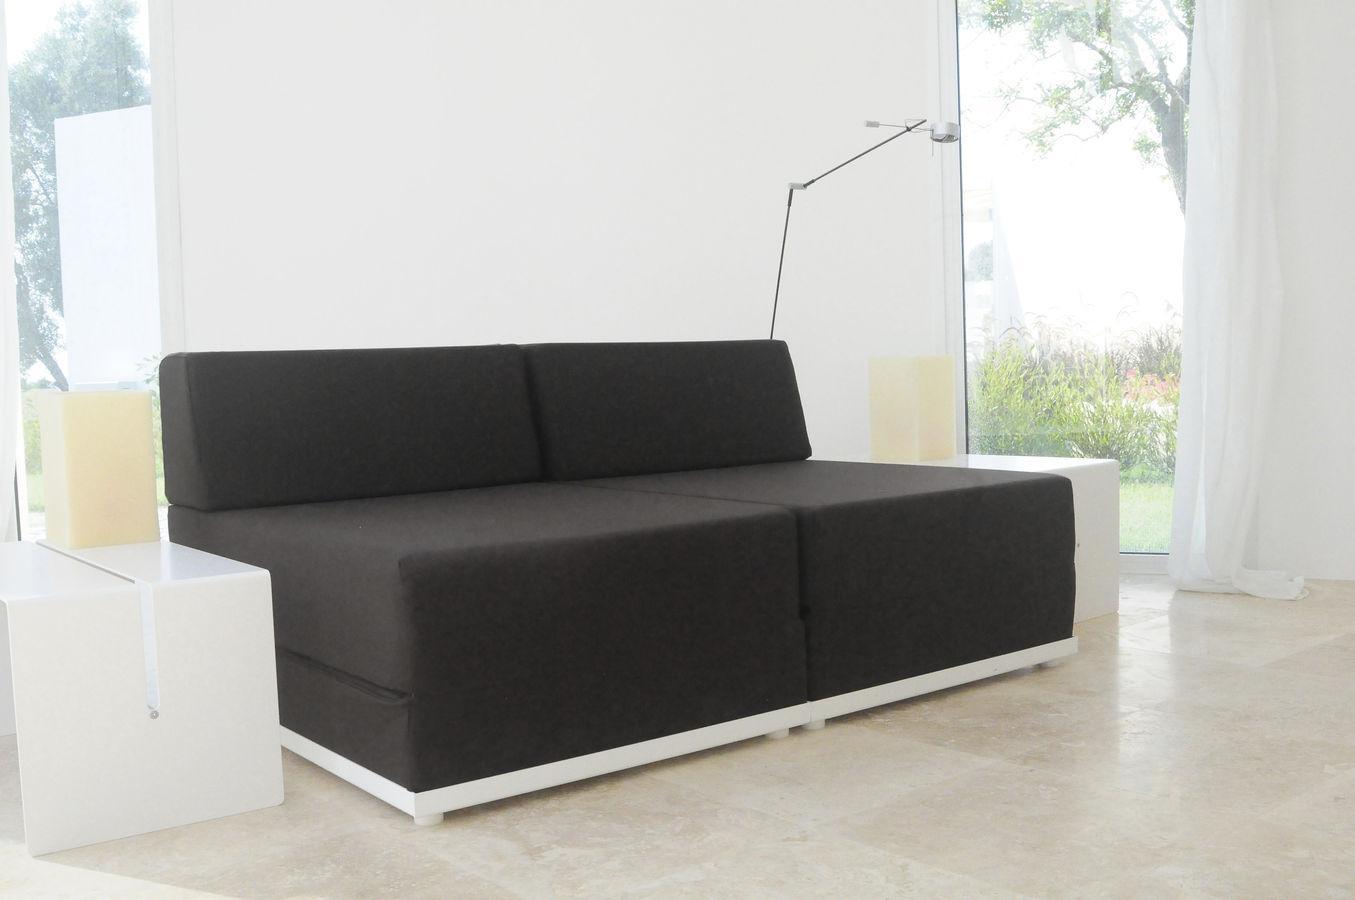 Sofas: Sofa Convertibles | Carlyle Sofa | Manhattan Sofas Regarding Sofa Convertibles (View 18 of 20)